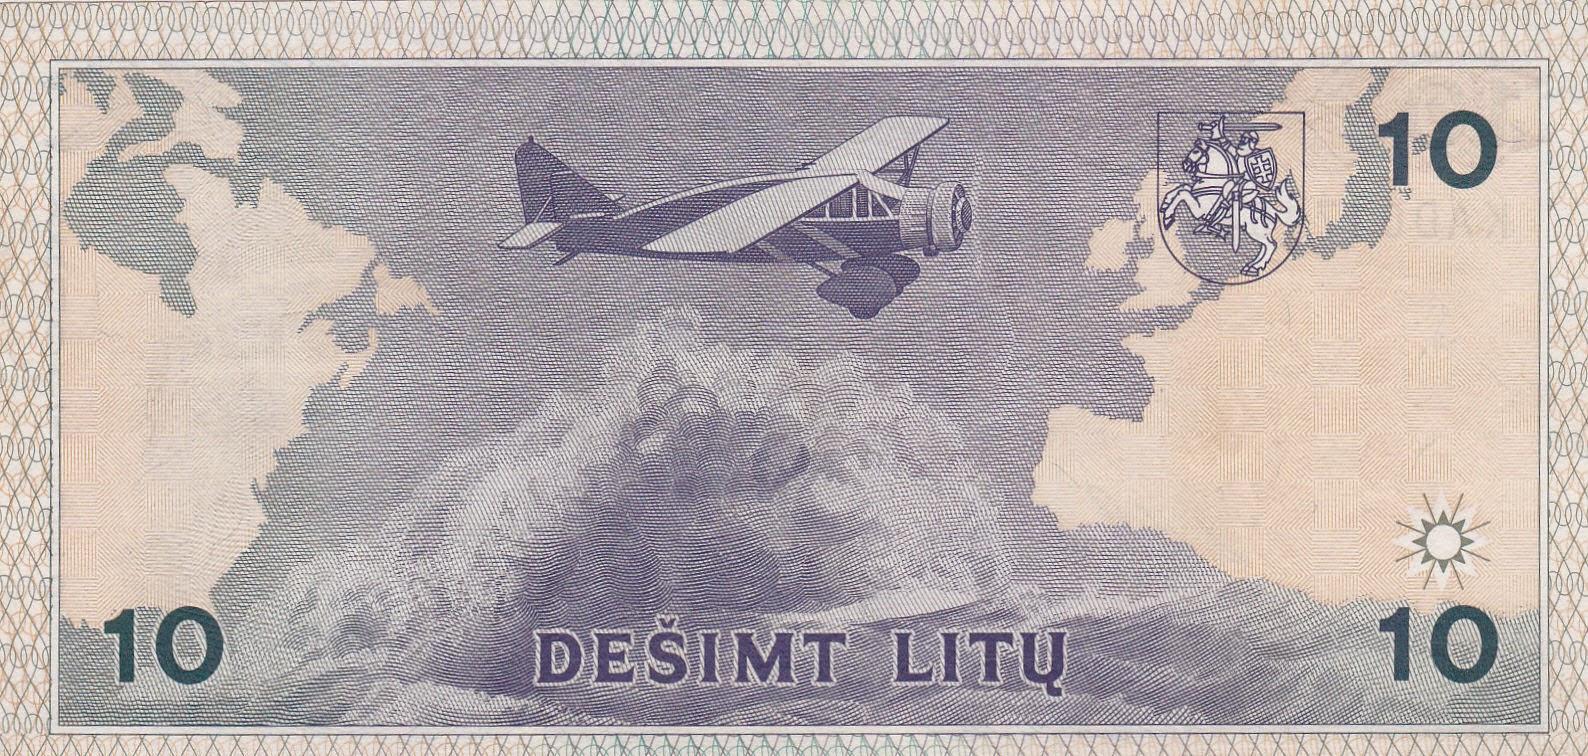 Lithuania 10 Litu banknote 1993 airplane